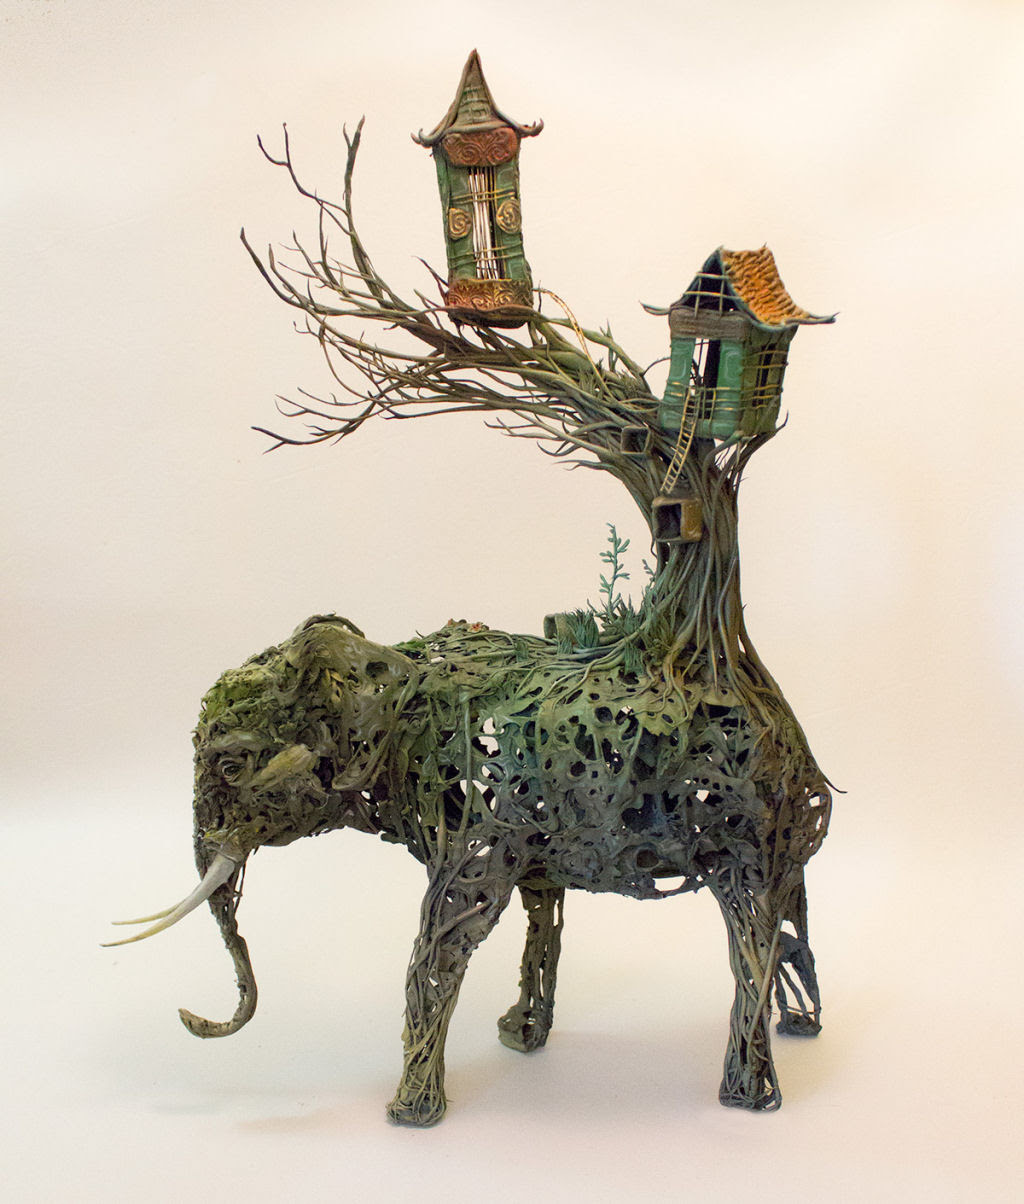 As esculturas surrealistas de Ellen Jewett mesclam plantas e vida animal 08